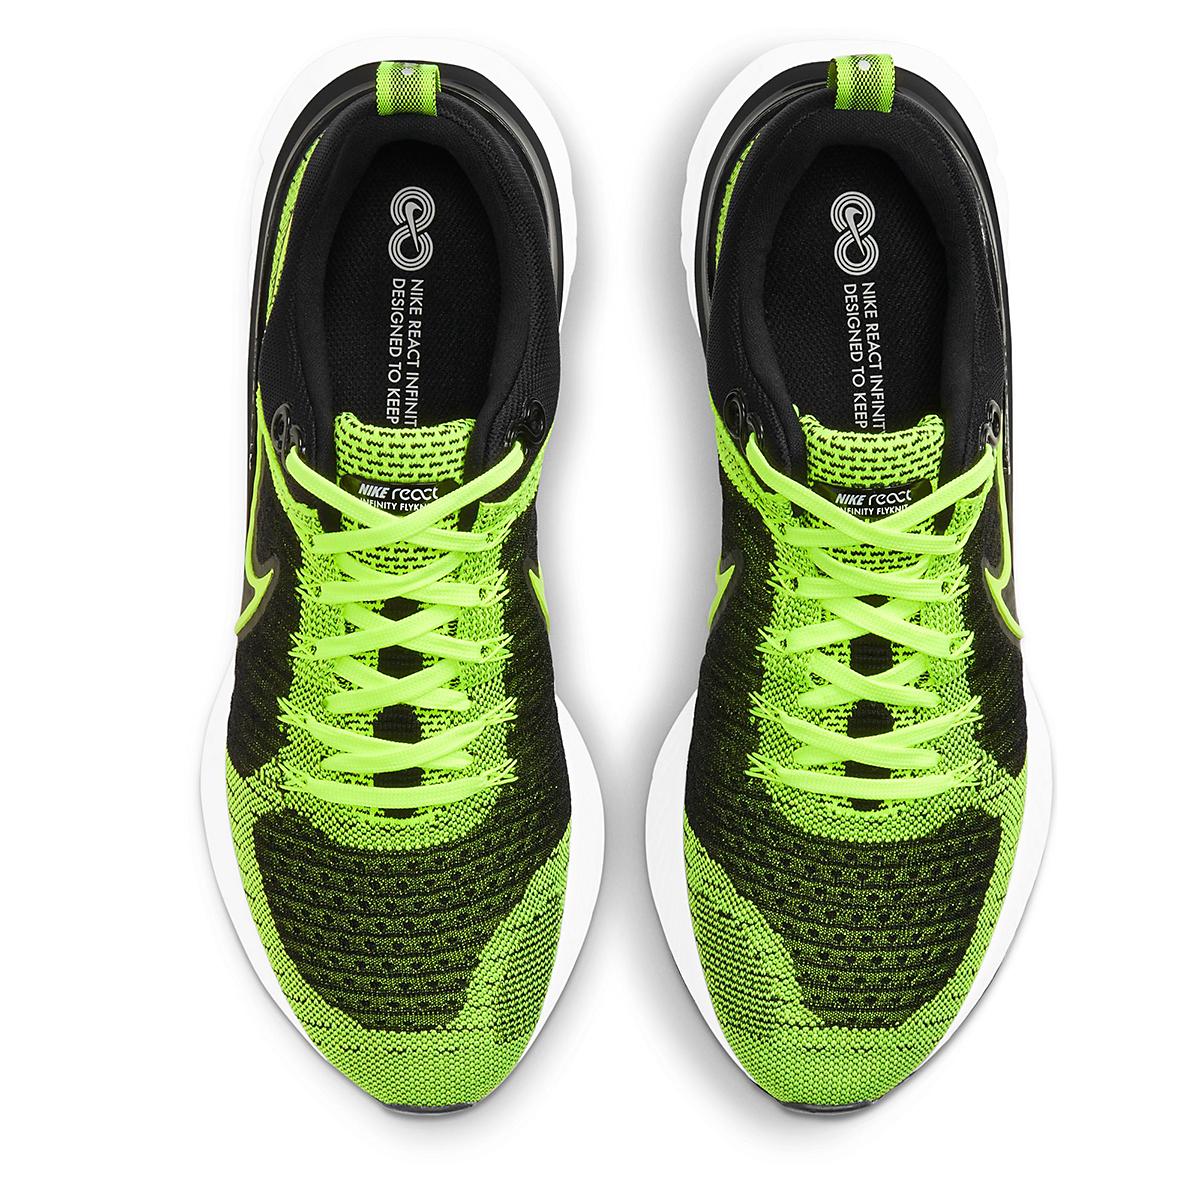 Men's Nike React Infinity Run Flyknit 2 Running Shoe - Color: Volt/Black - Size: 6 - Width: Regular, Volt/Black, large, image 7